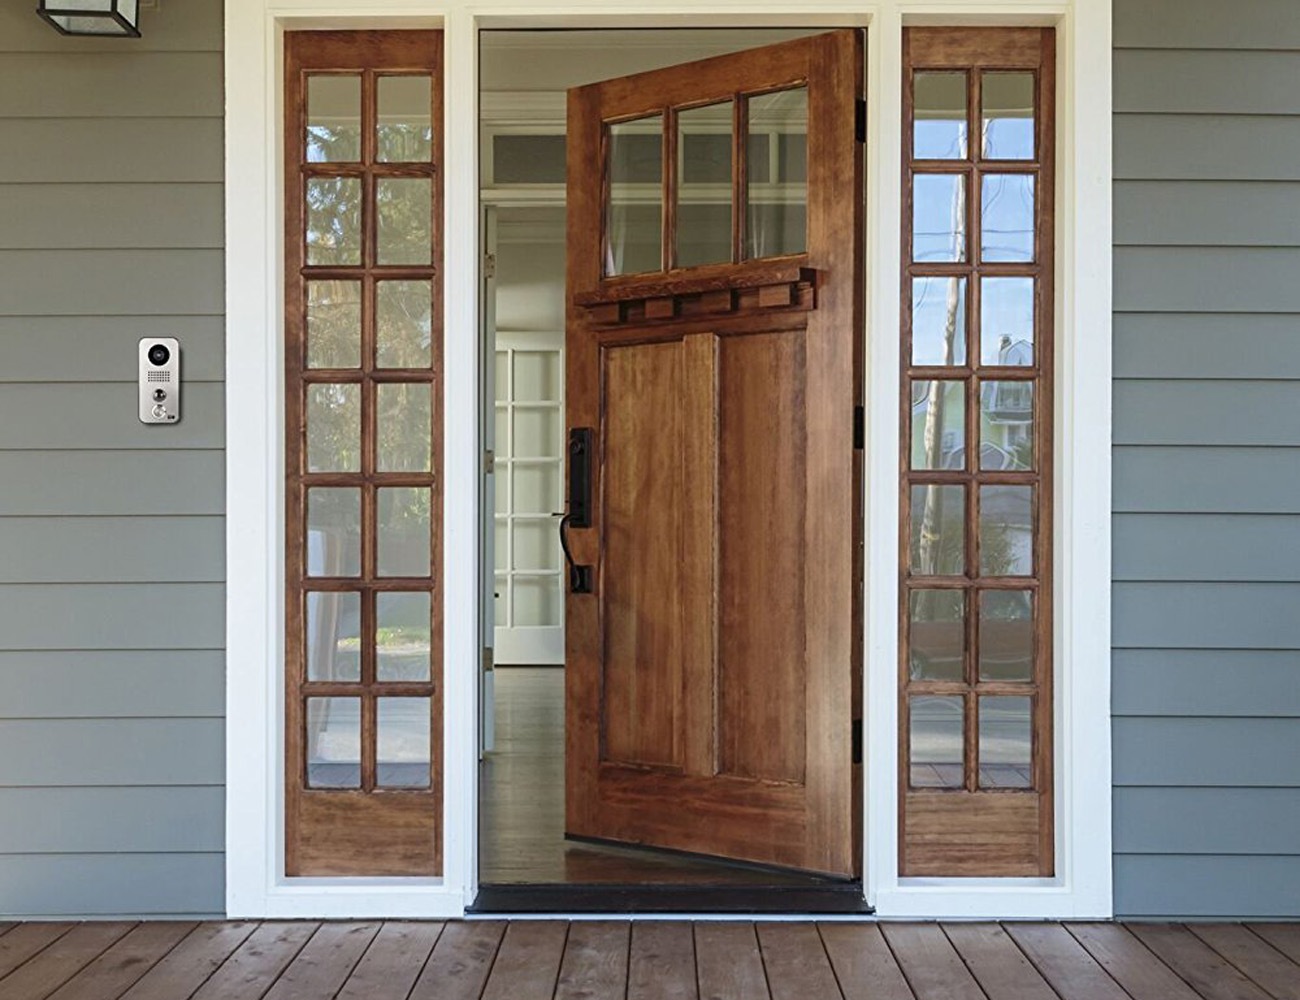 DoorBird Home Automation